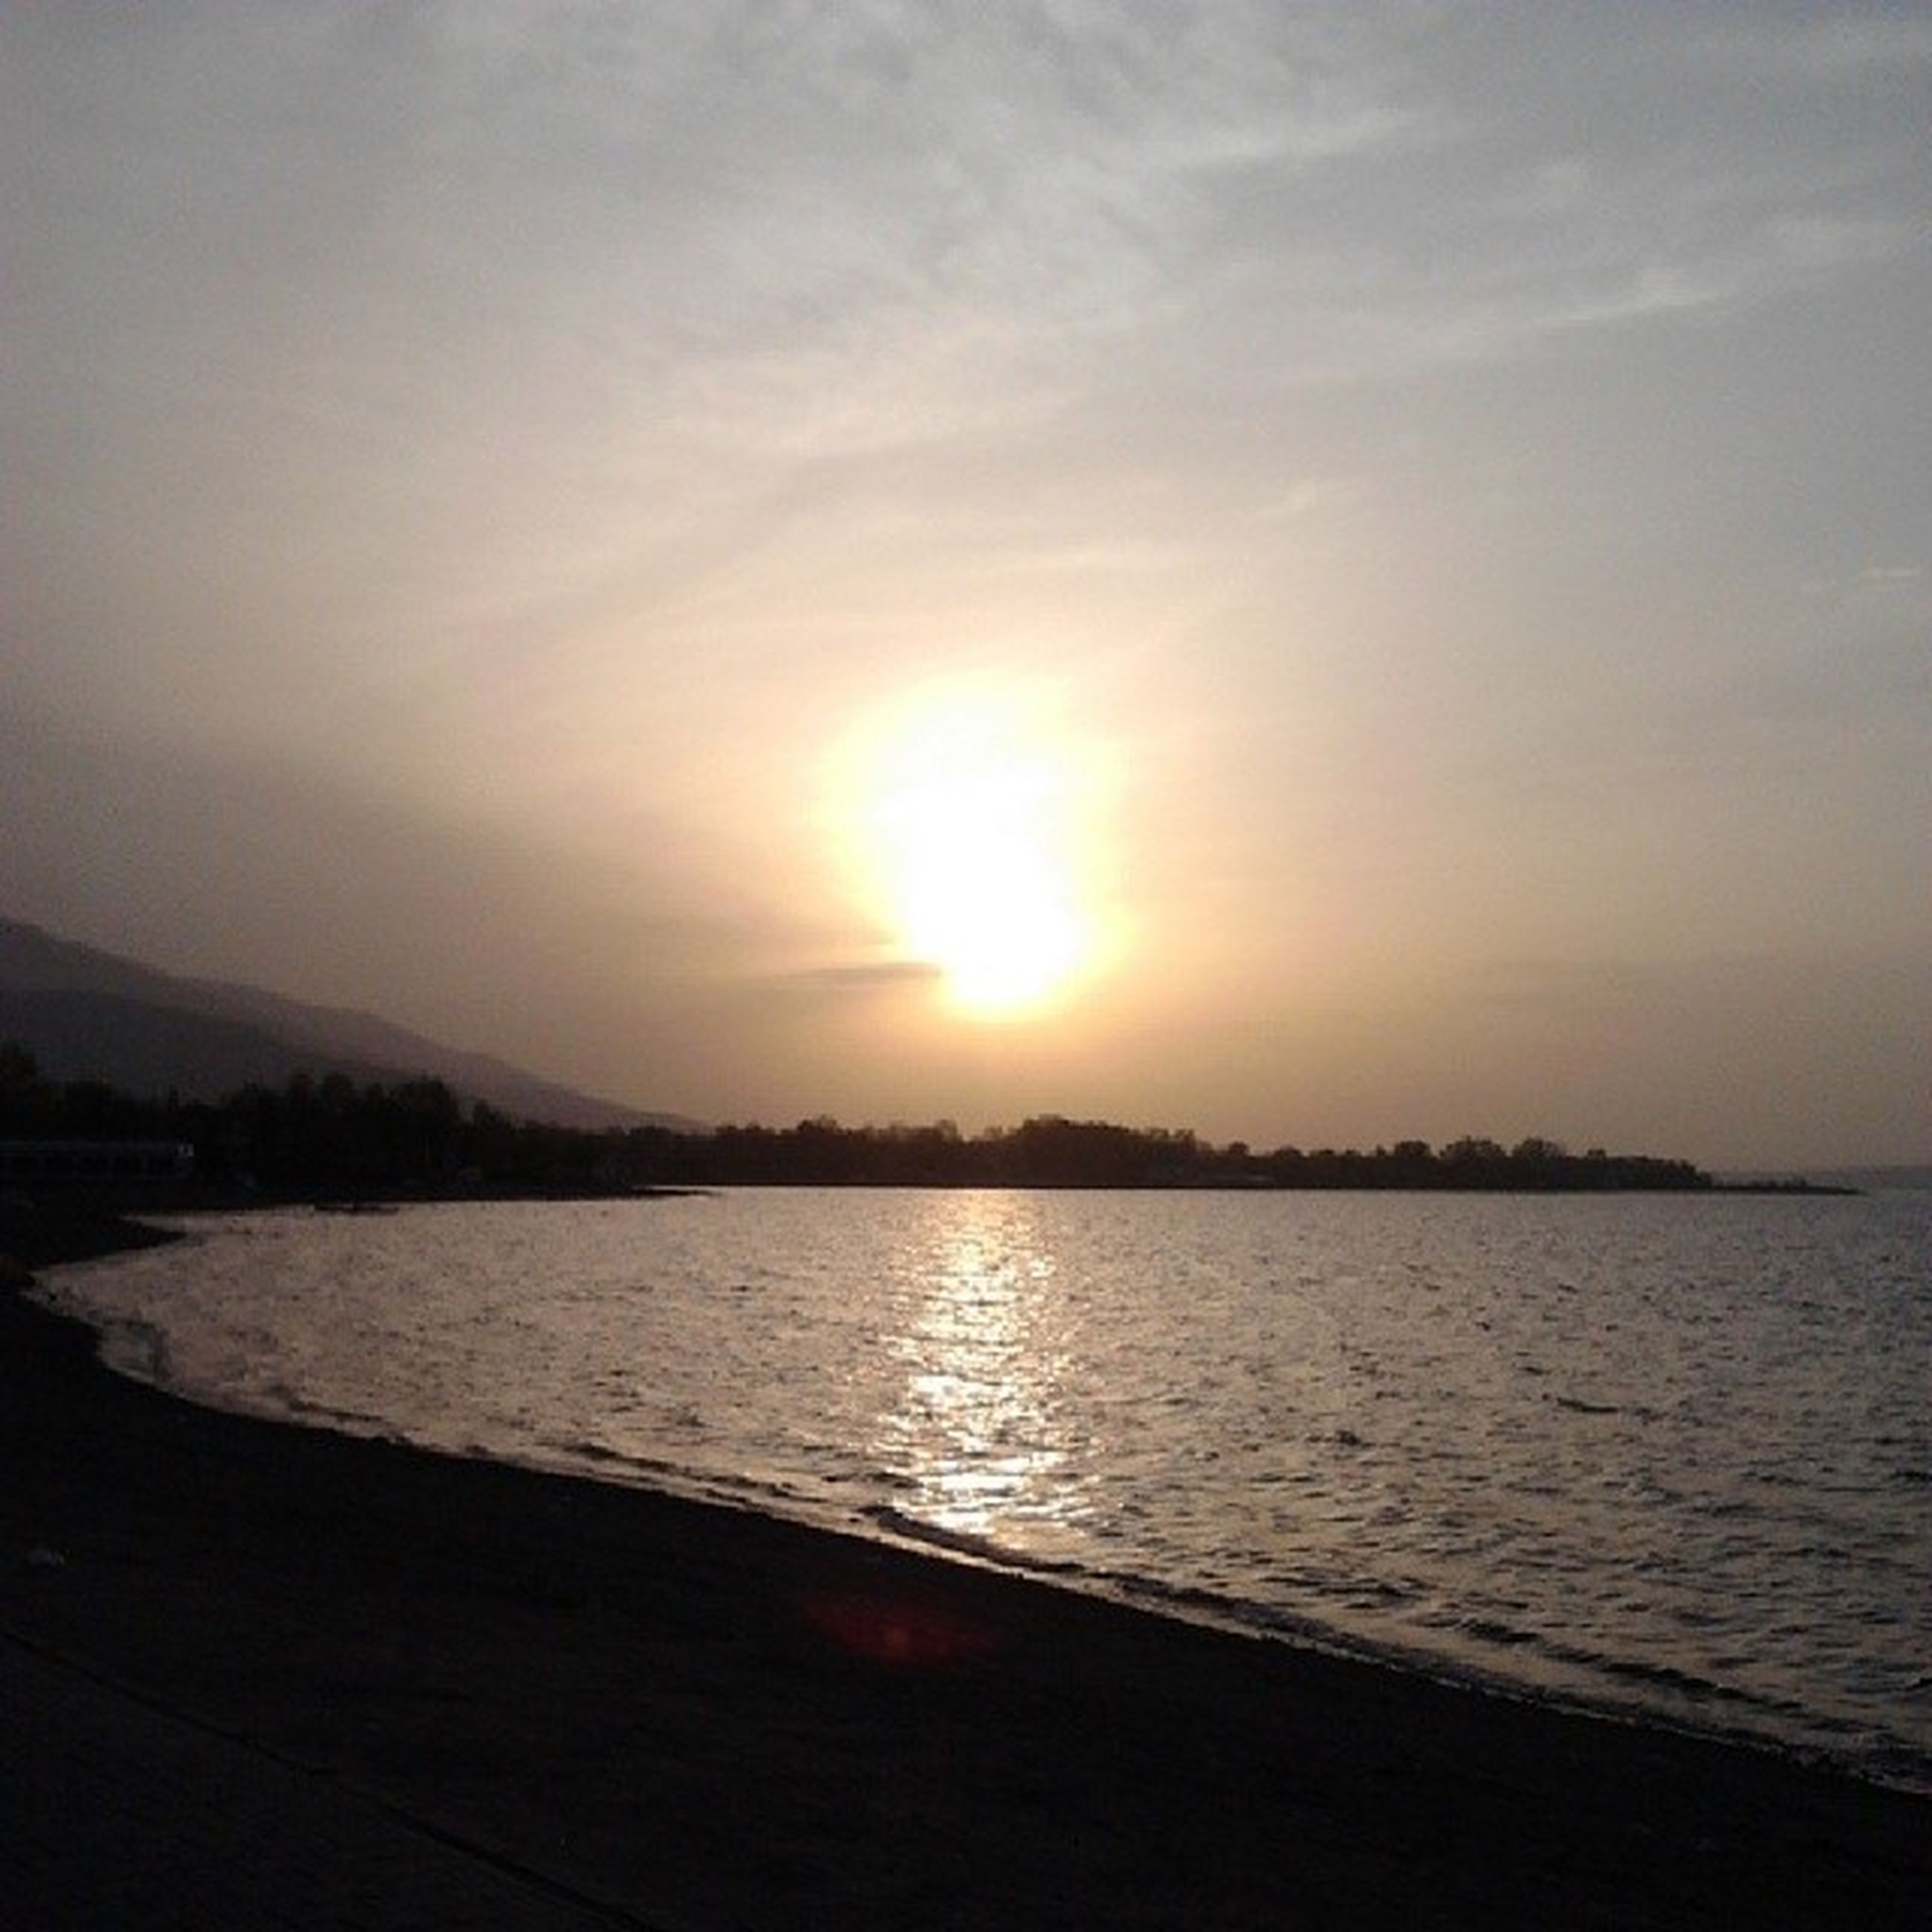 sunset, water, tranquil scene, scenics, tranquility, beauty in nature, sun, sky, sea, beach, mountain, nature, idyllic, sunlight, shore, silhouette, reflection, lake, orange color, non-urban scene